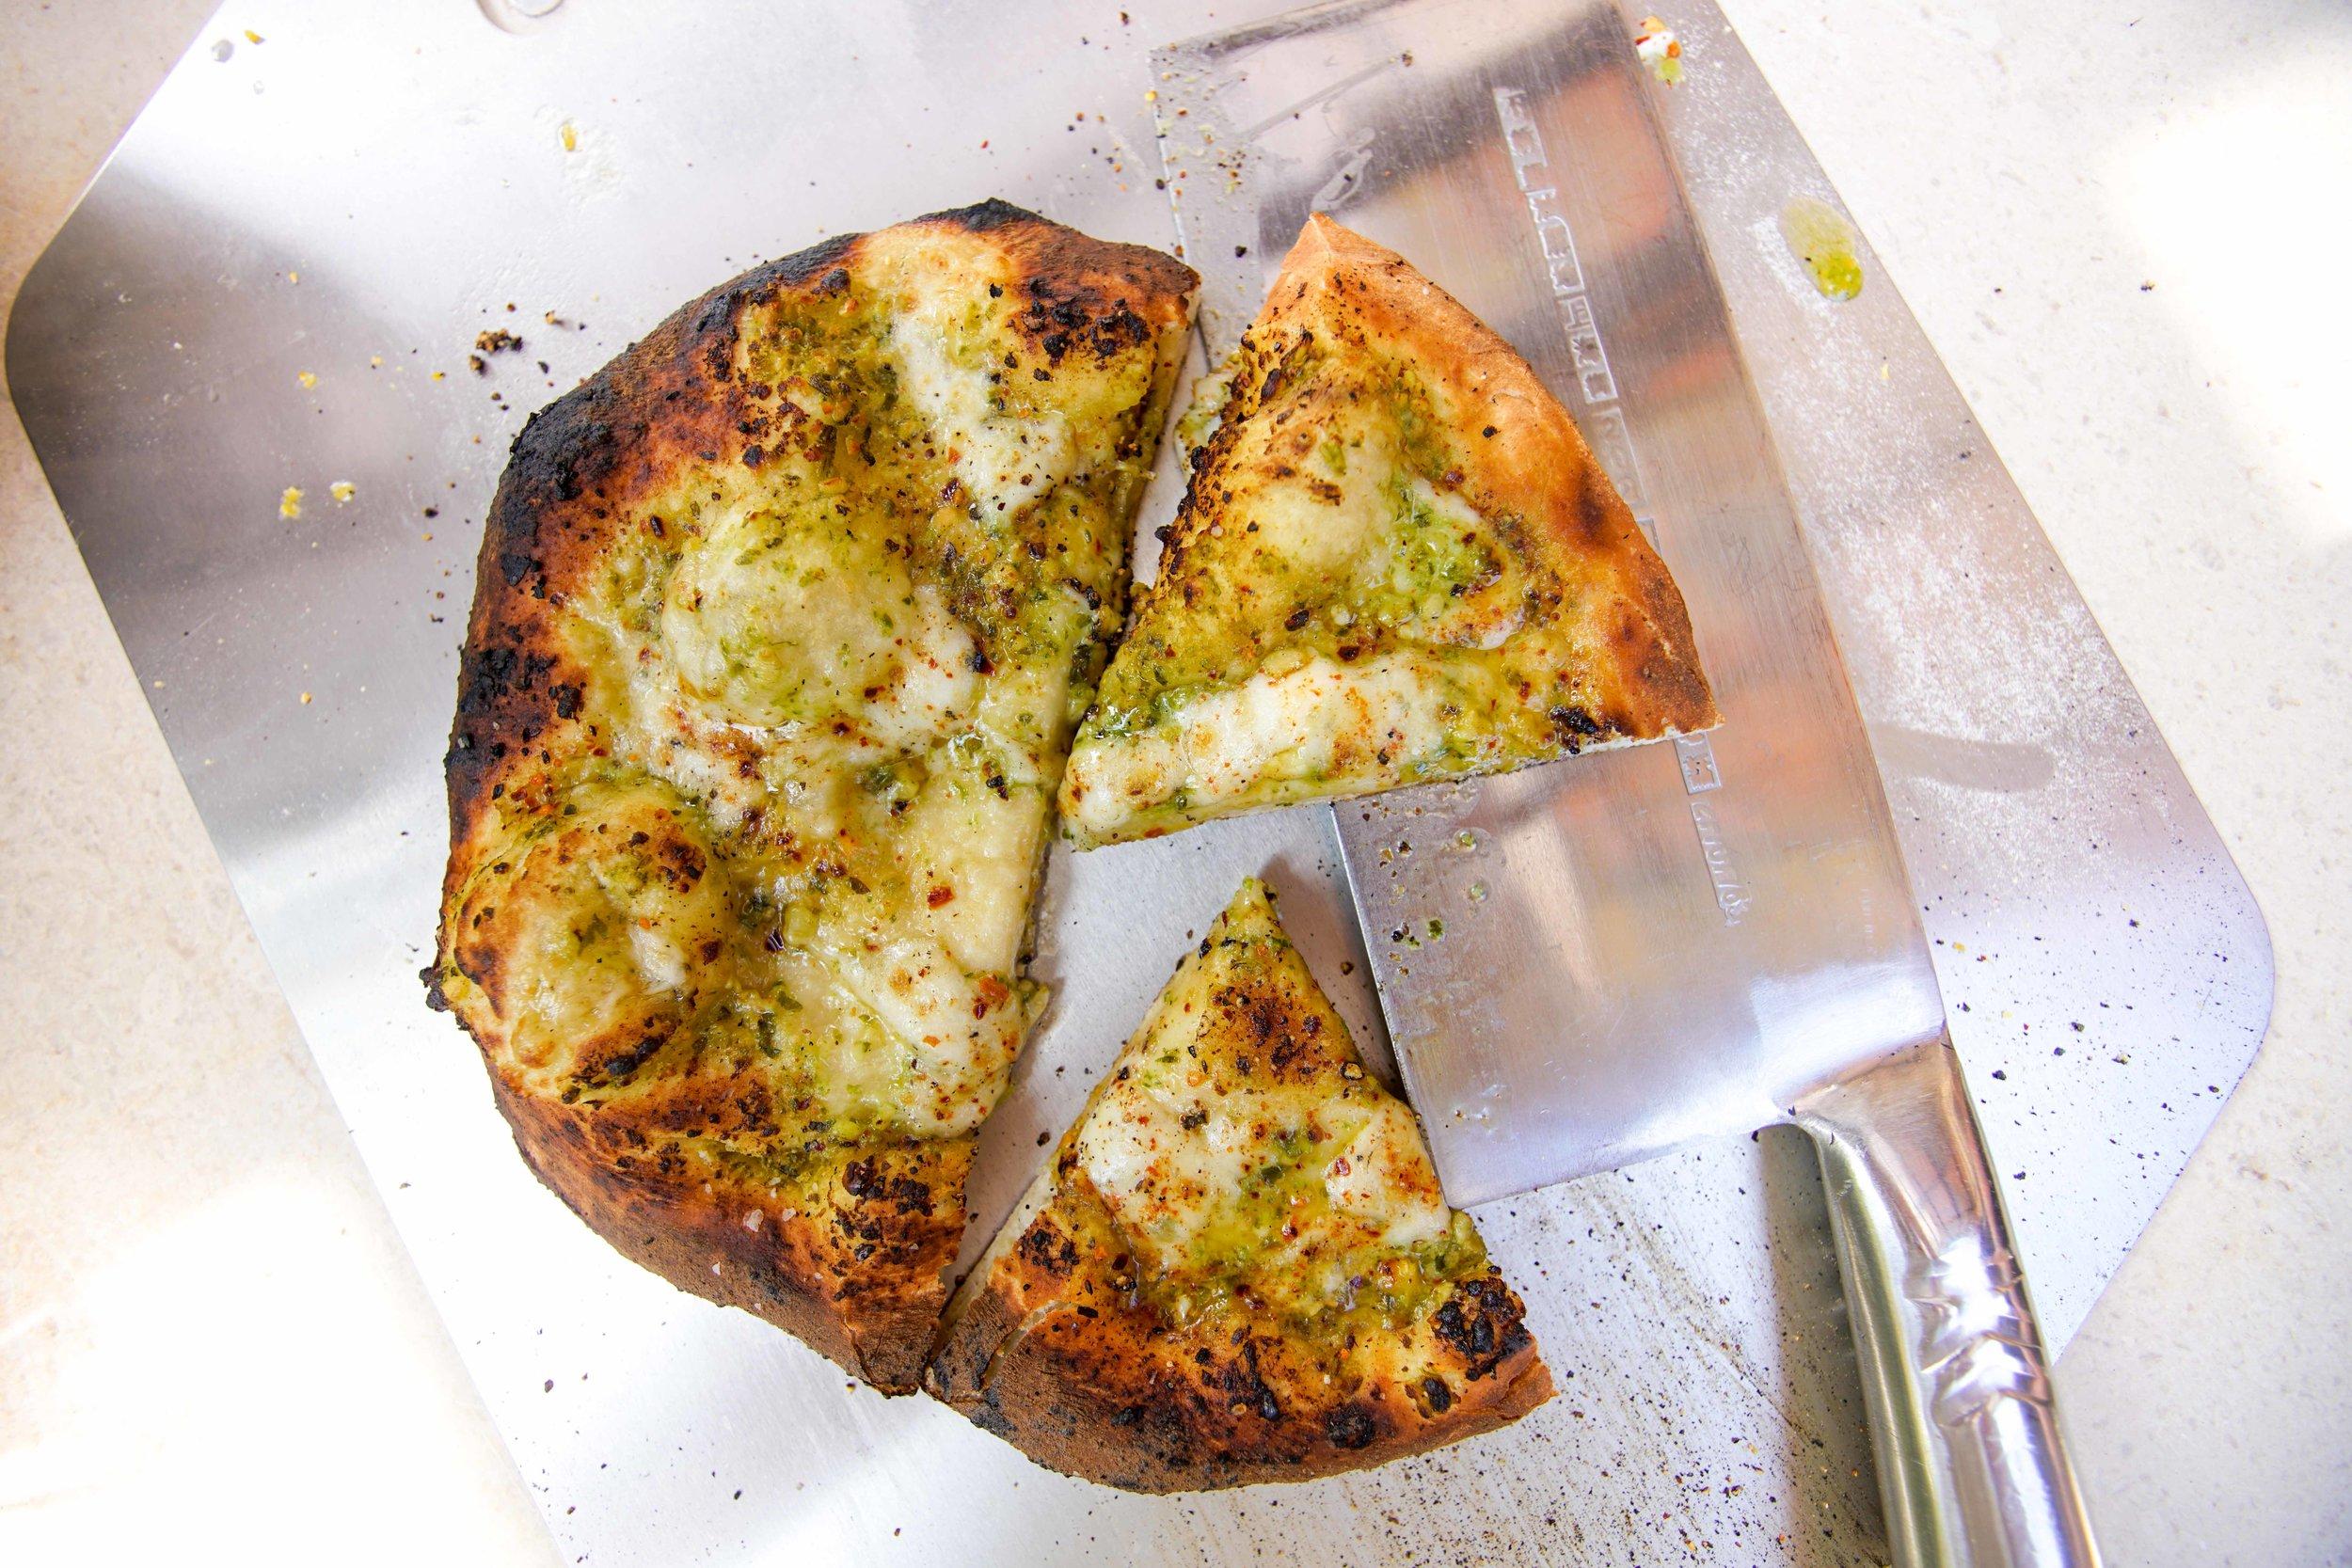 pesto pizza stcgo.jpg